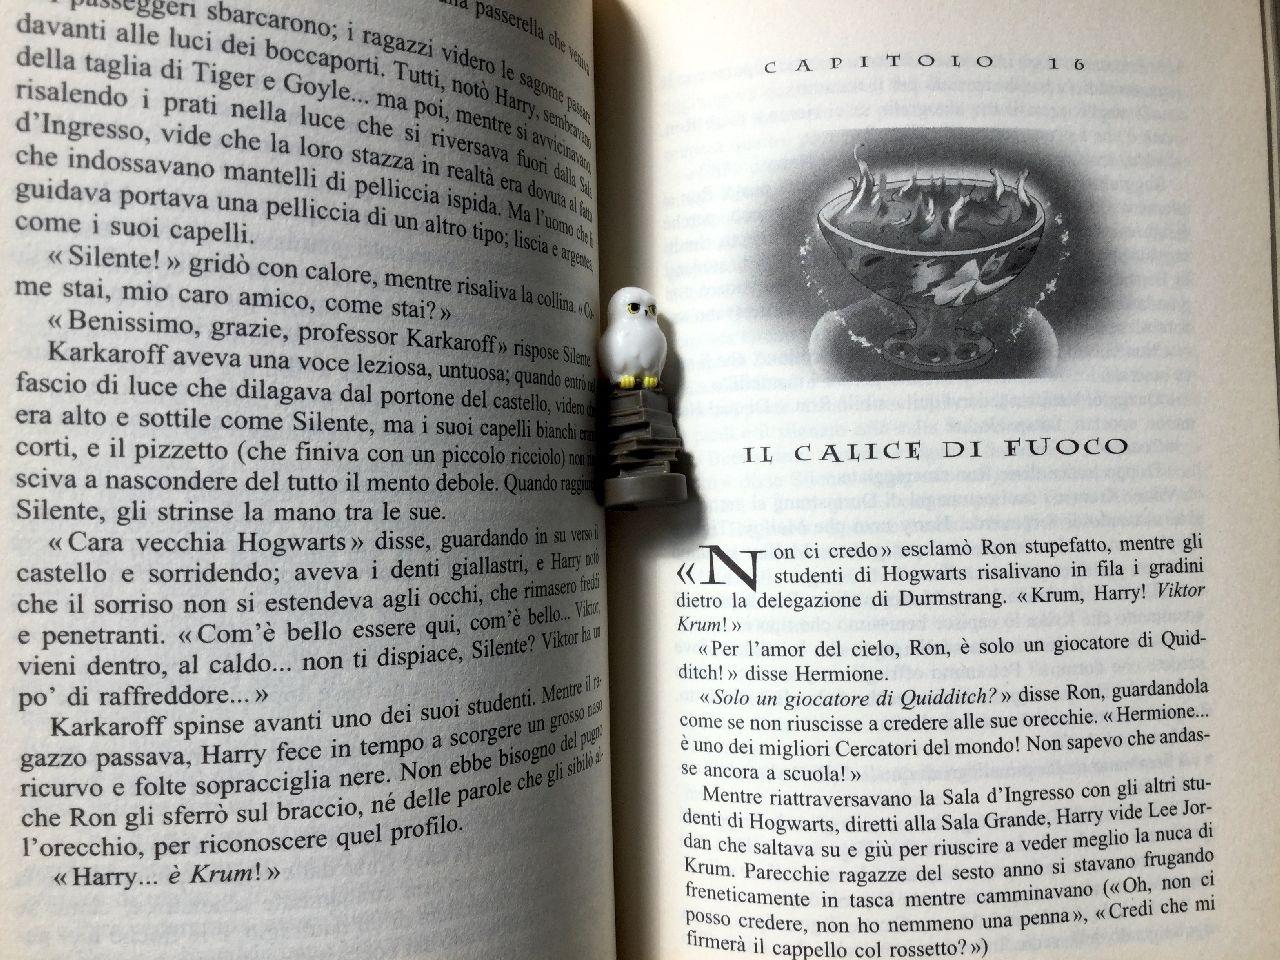 J. K. Rowling, Harry Potter, Salani